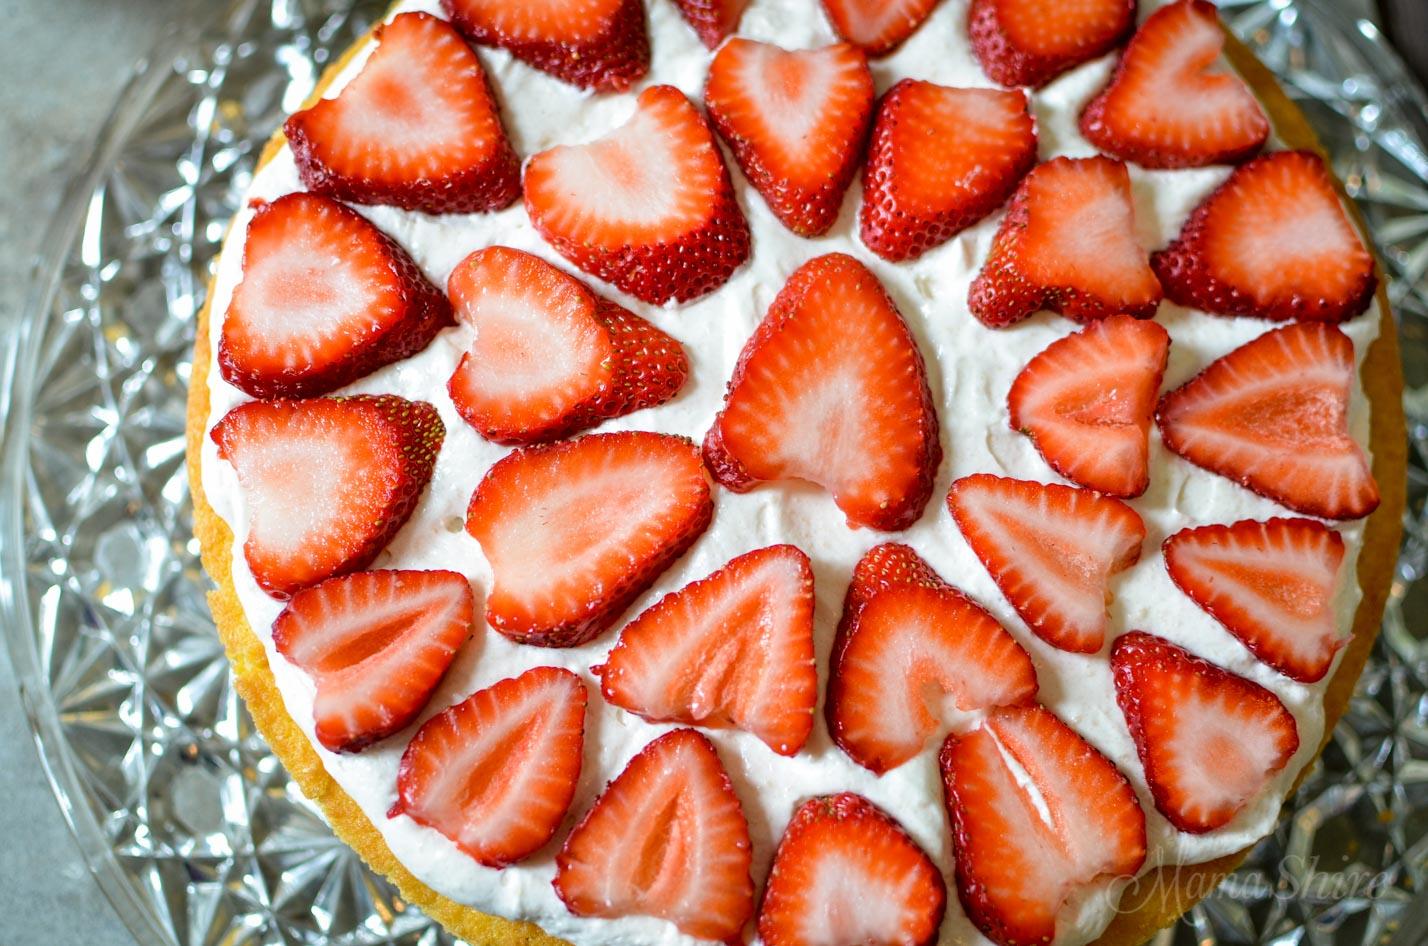 Strawberry Shortcake Grain-free, Dairy-free, Sugar-free